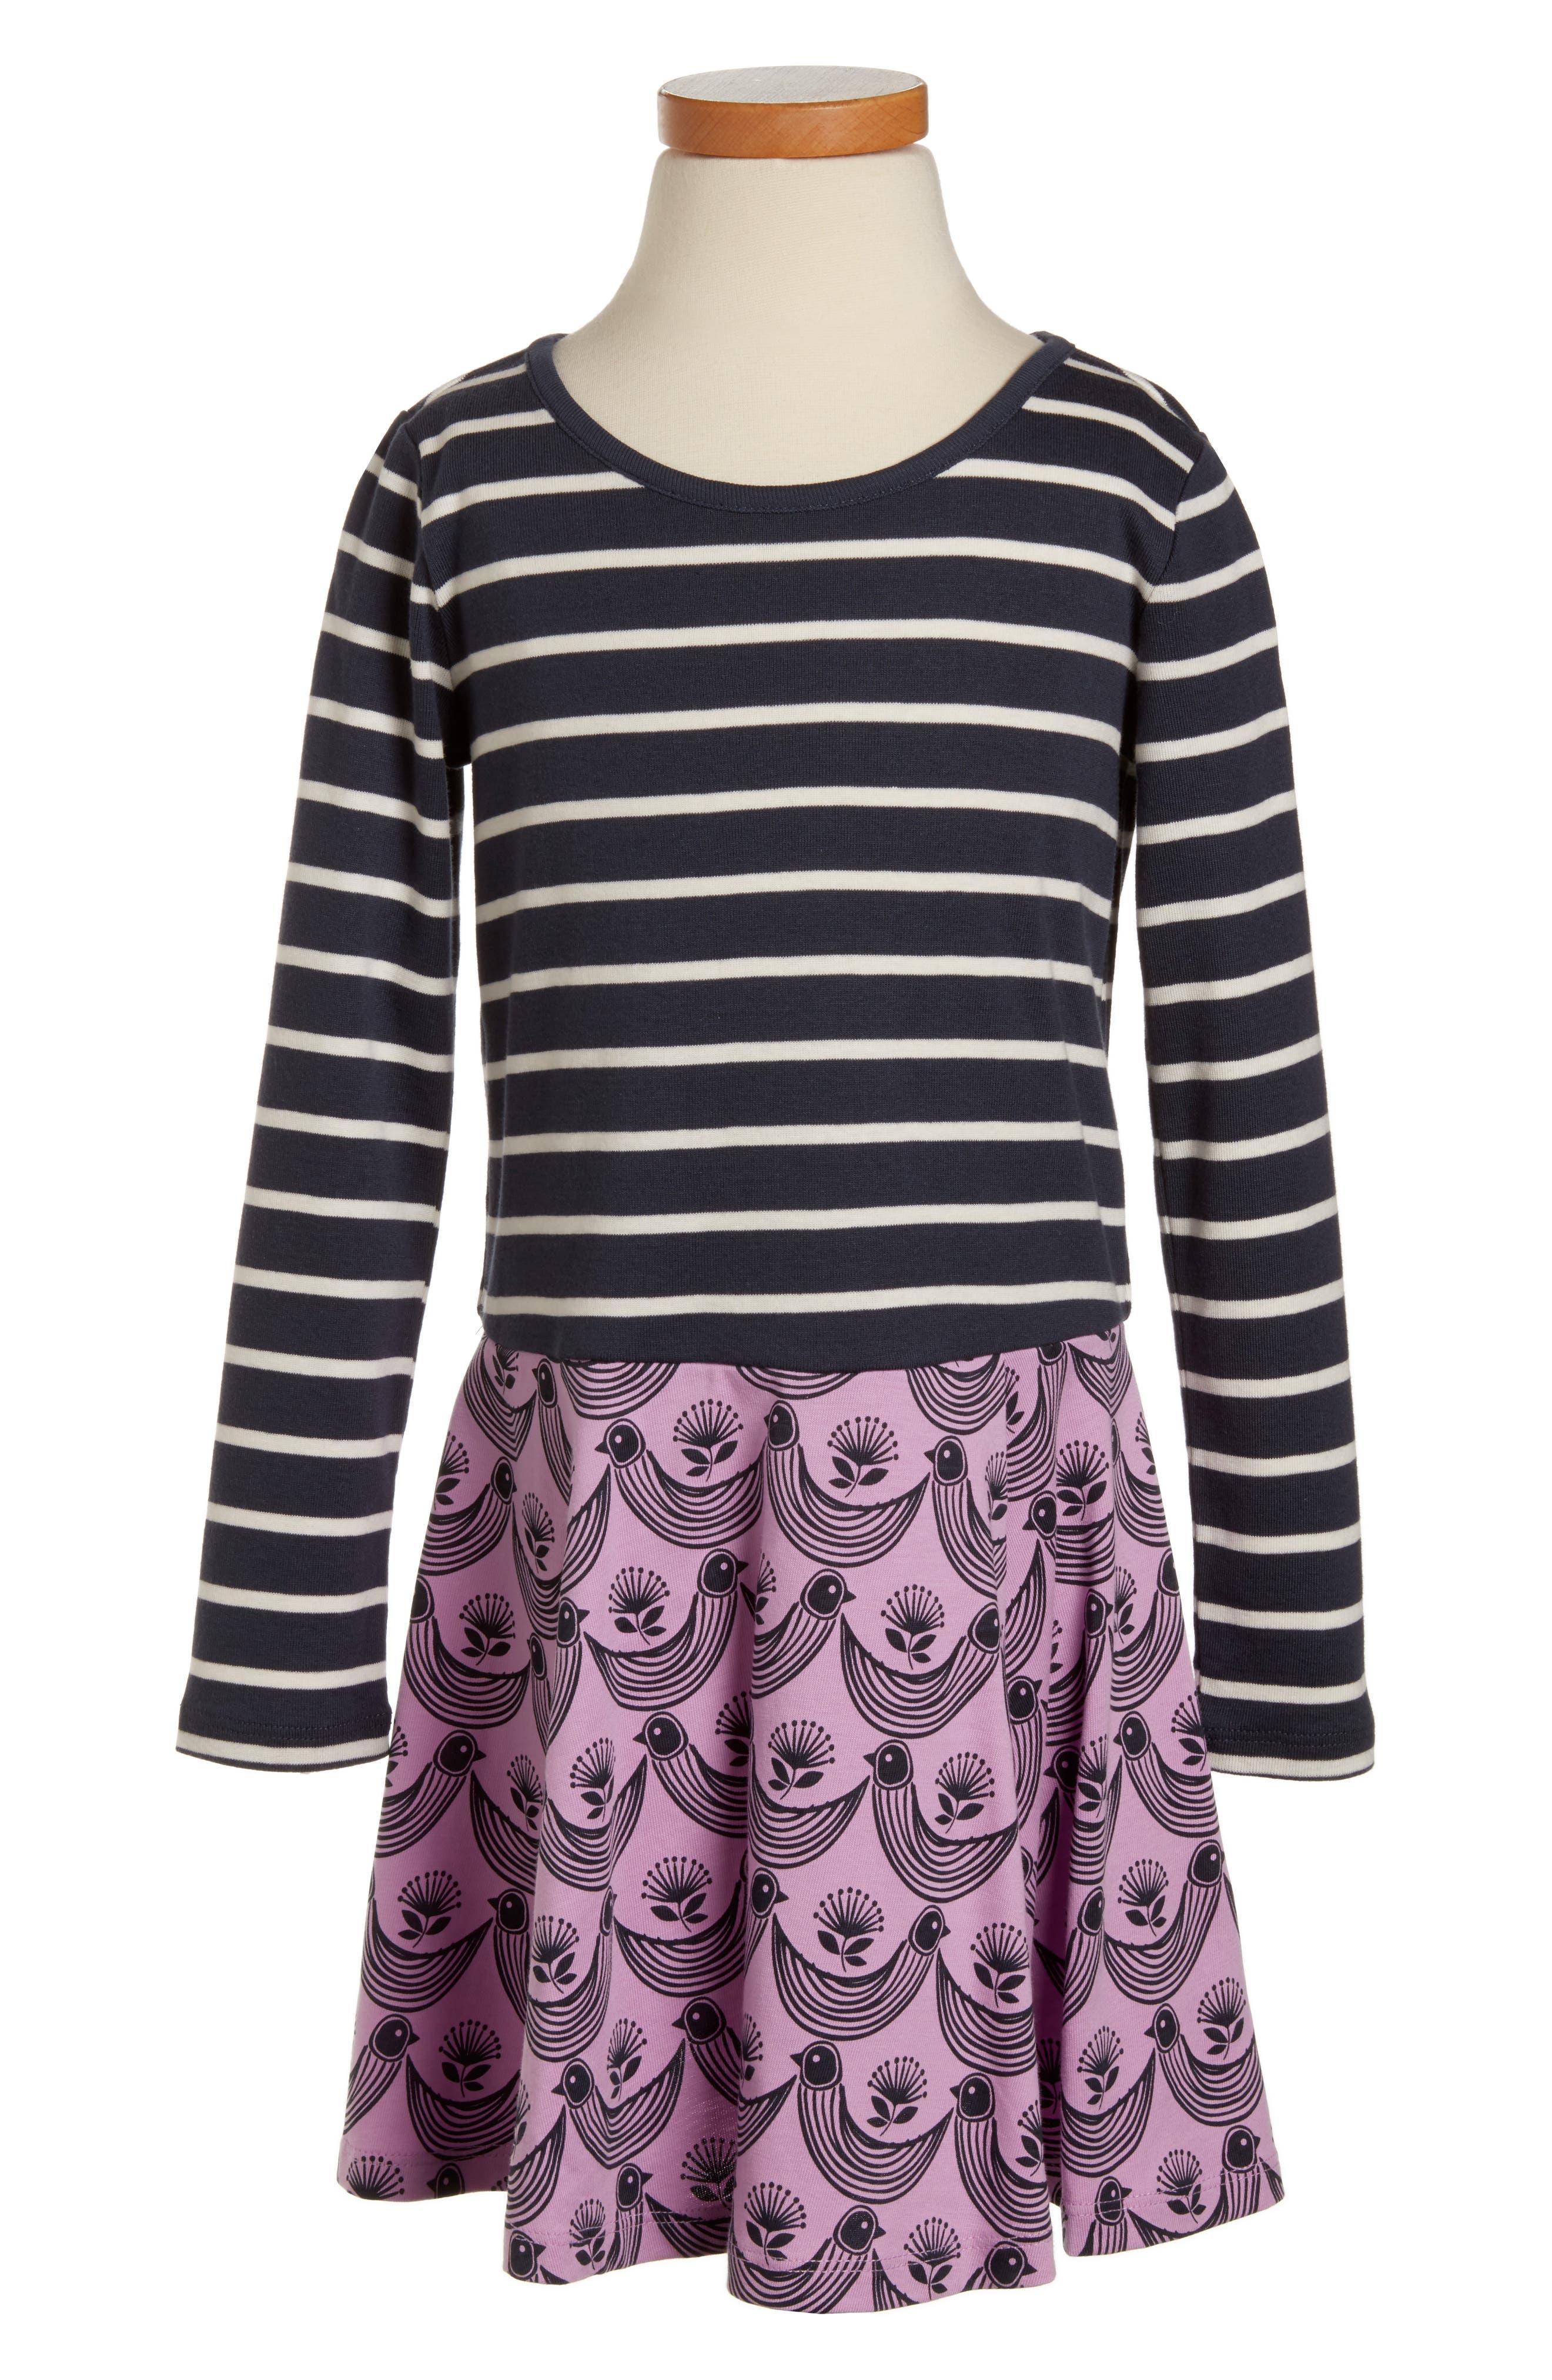 Main Image - Tea Collection Mixed Print Dress (Toddler Girls, Little Girls & Big Girls)